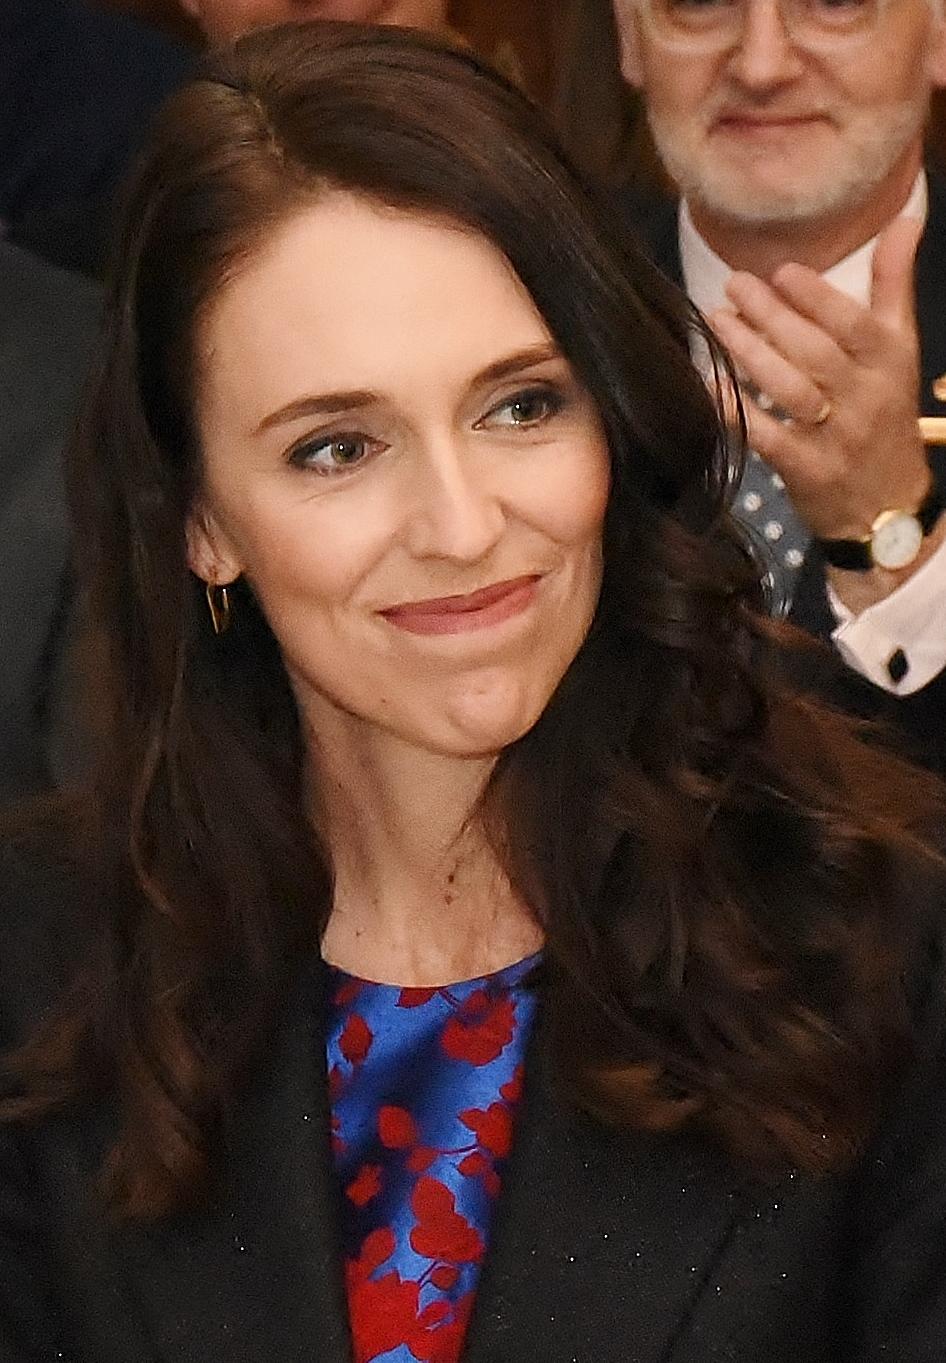 PM-designate Jacinda Ardern before the Swearing-in